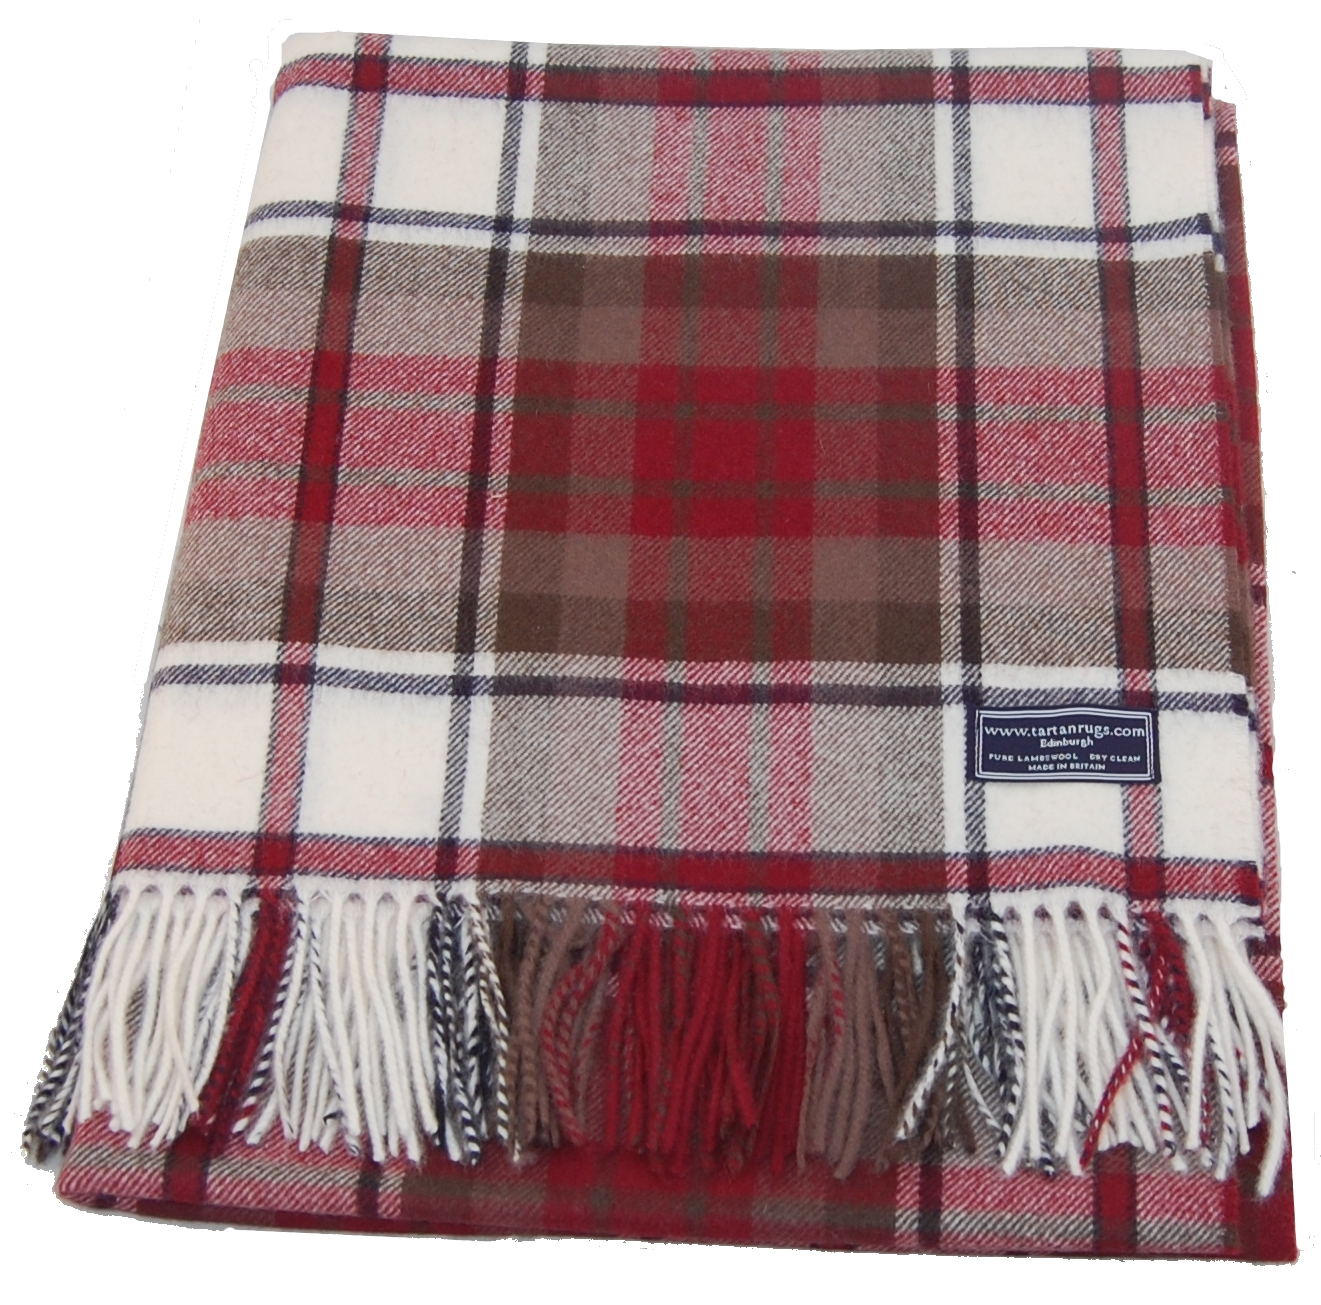 natural dress stewart tartan lambswool travel rug. Black Bedroom Furniture Sets. Home Design Ideas